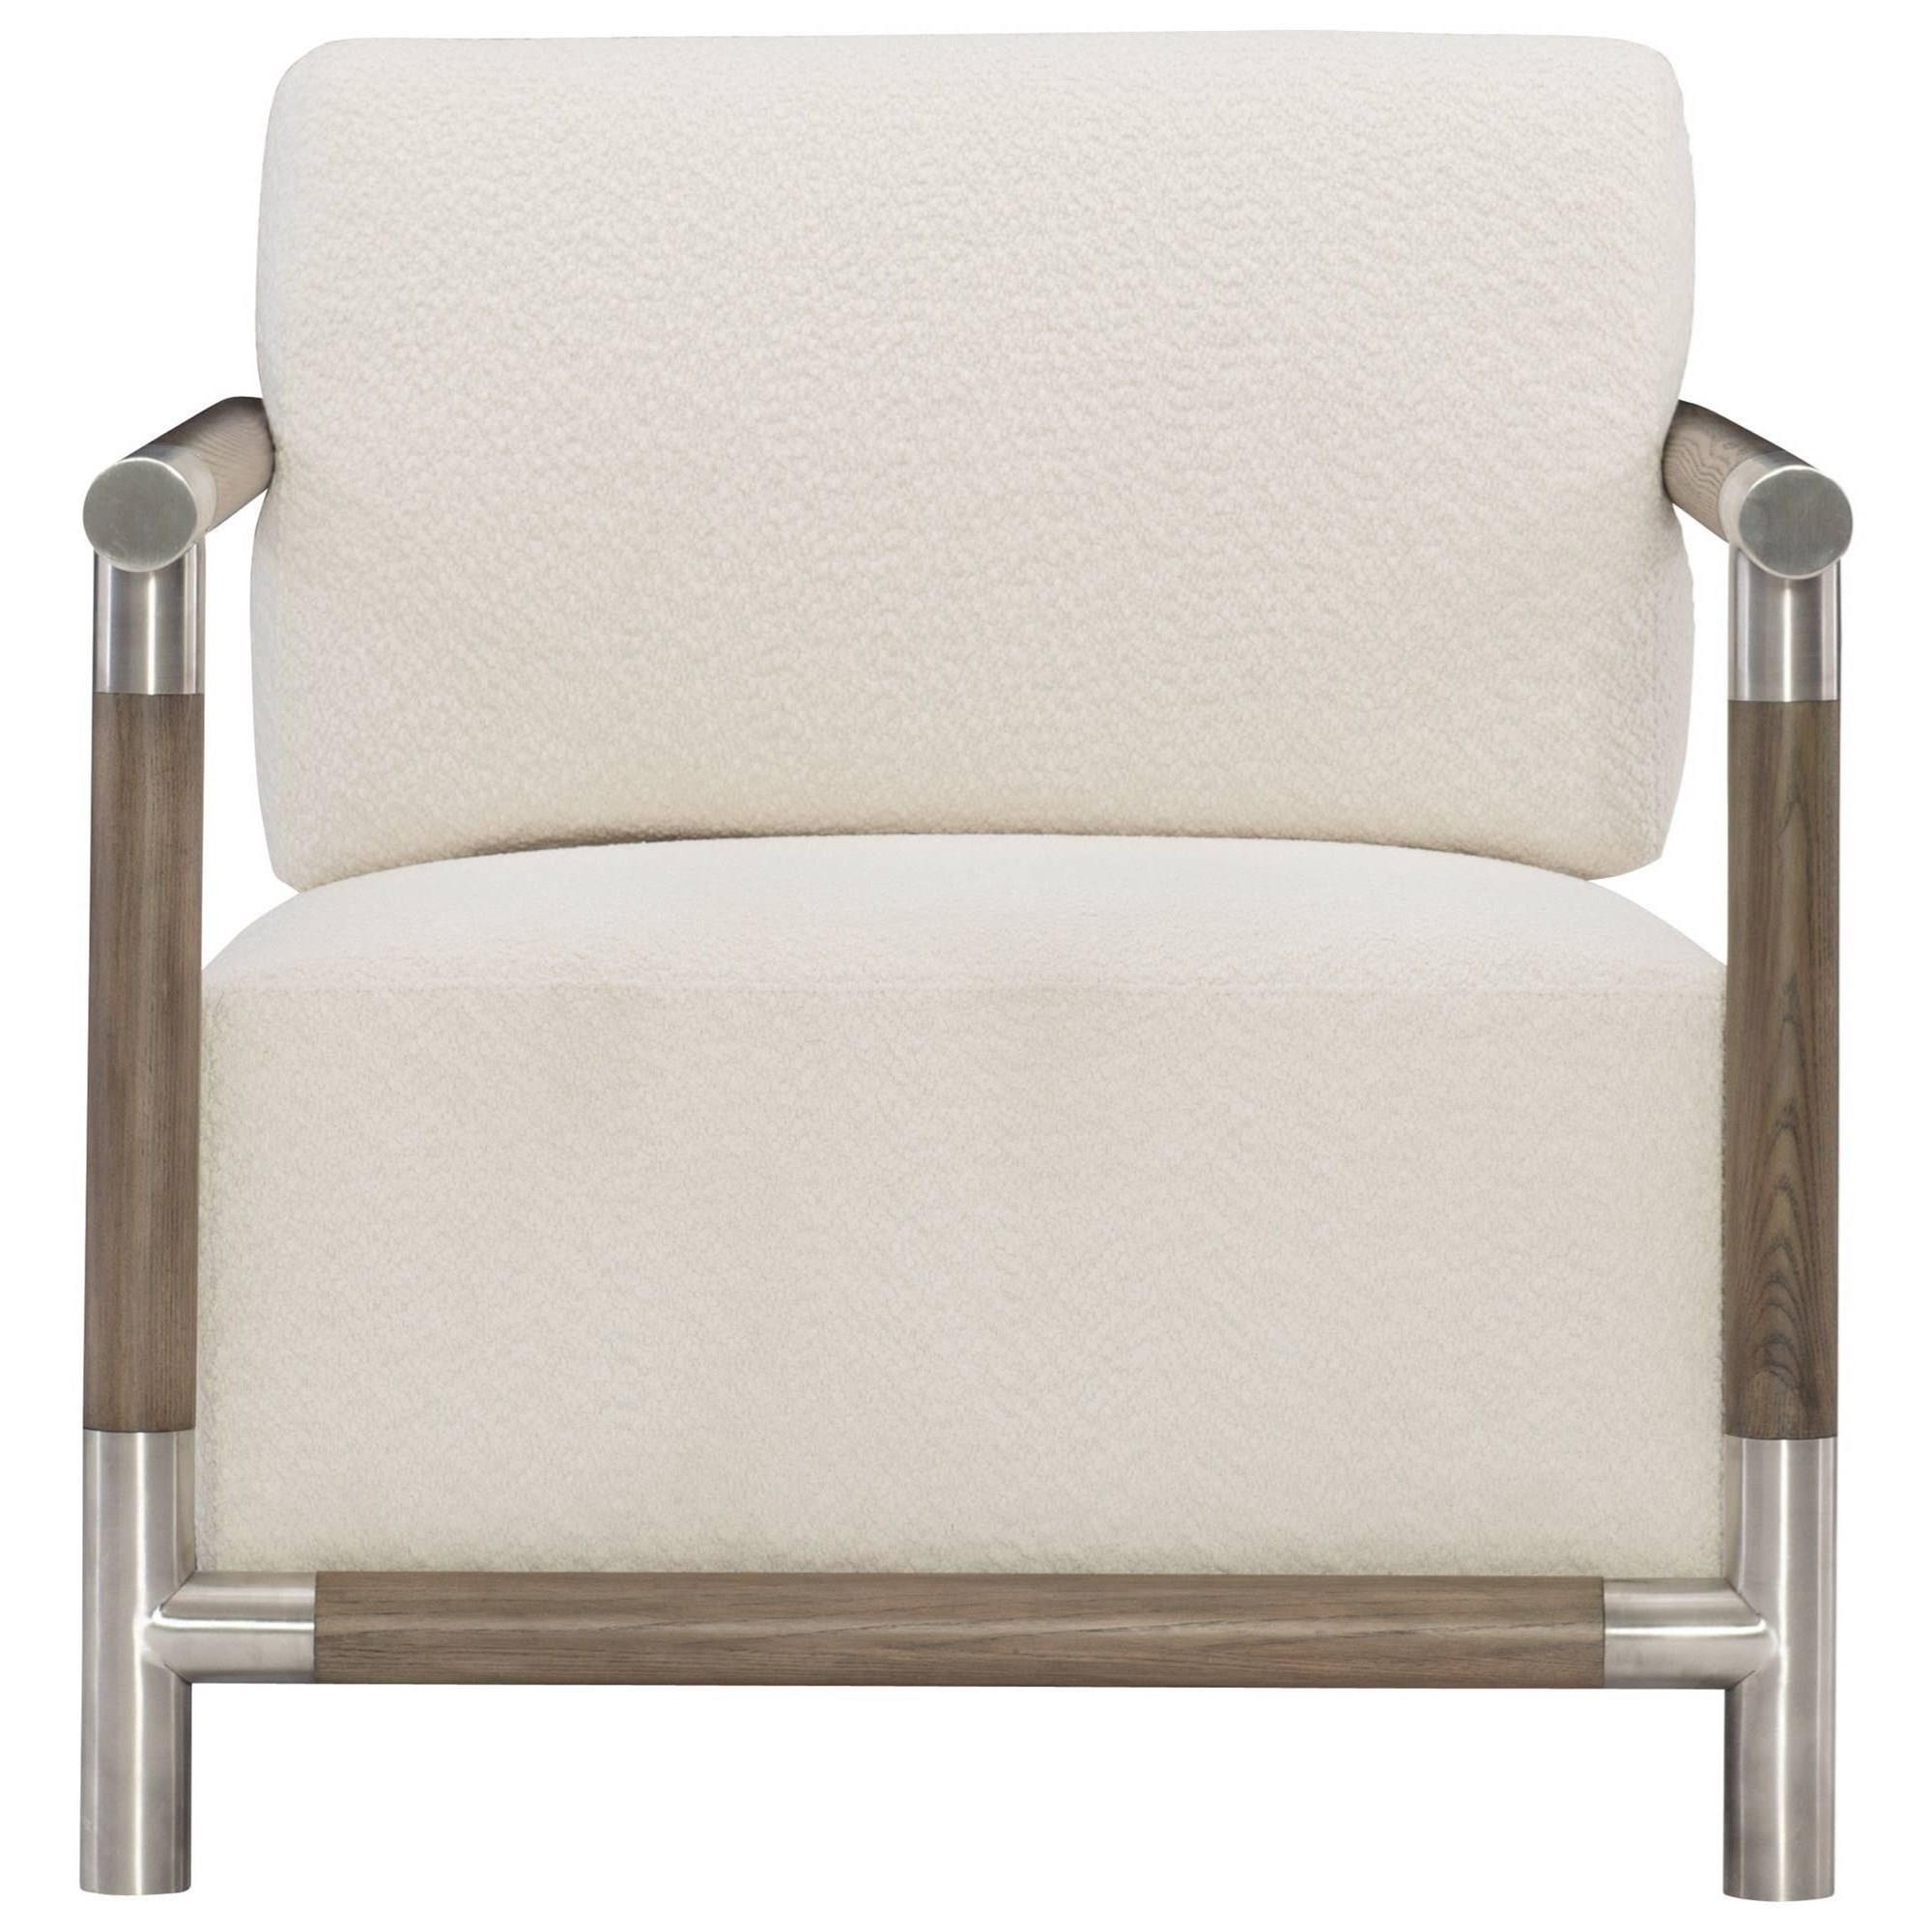 Kylie Chair by Bernhardt at Dunk & Bright Furniture